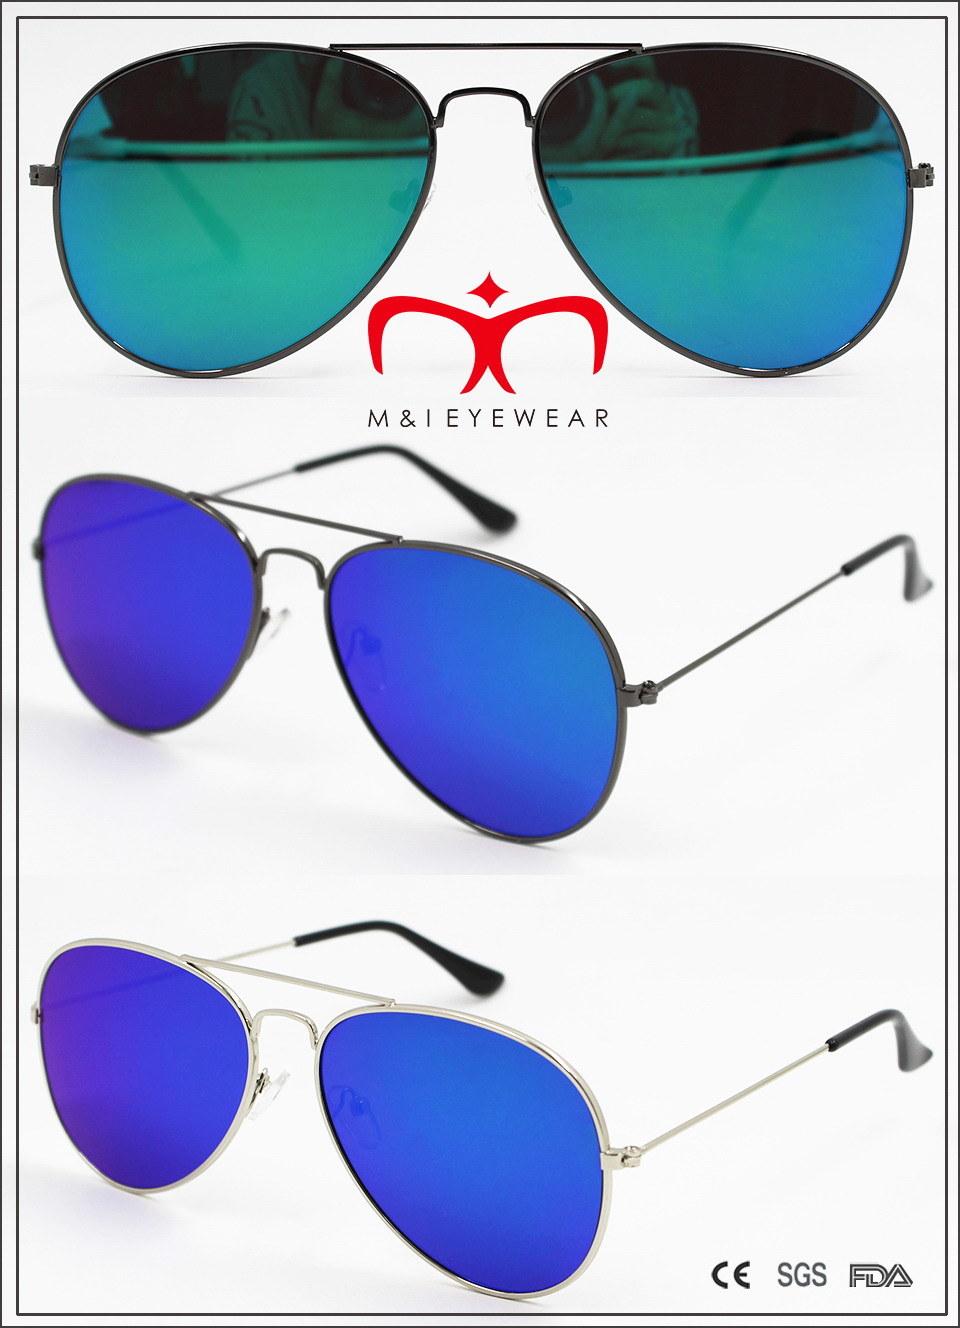 New Fashion Metal Sunglasses with Flat Lens (MI160223)